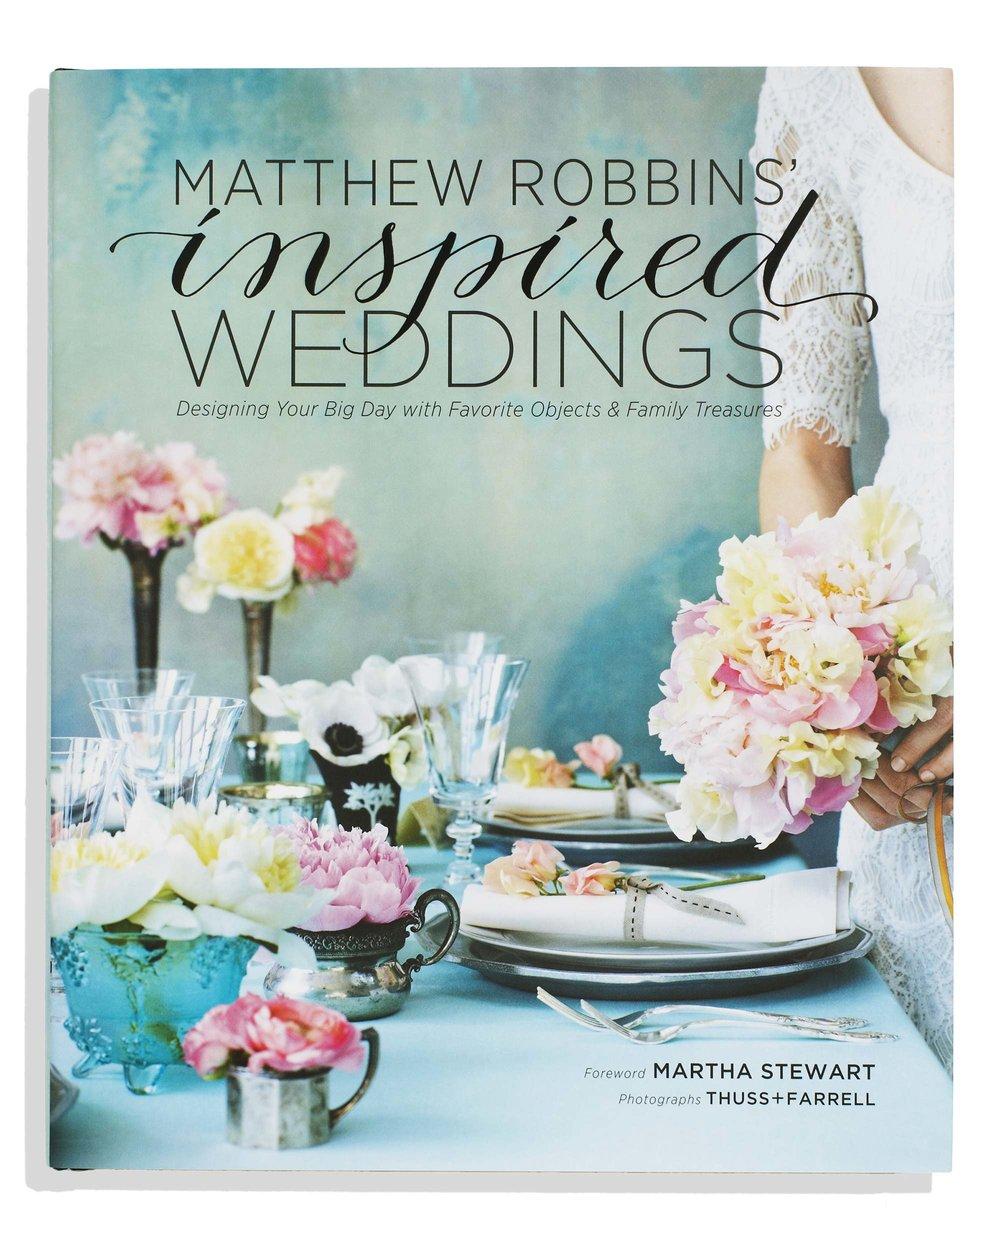 M-Robbins-Book-Jacket_Flat.jpg